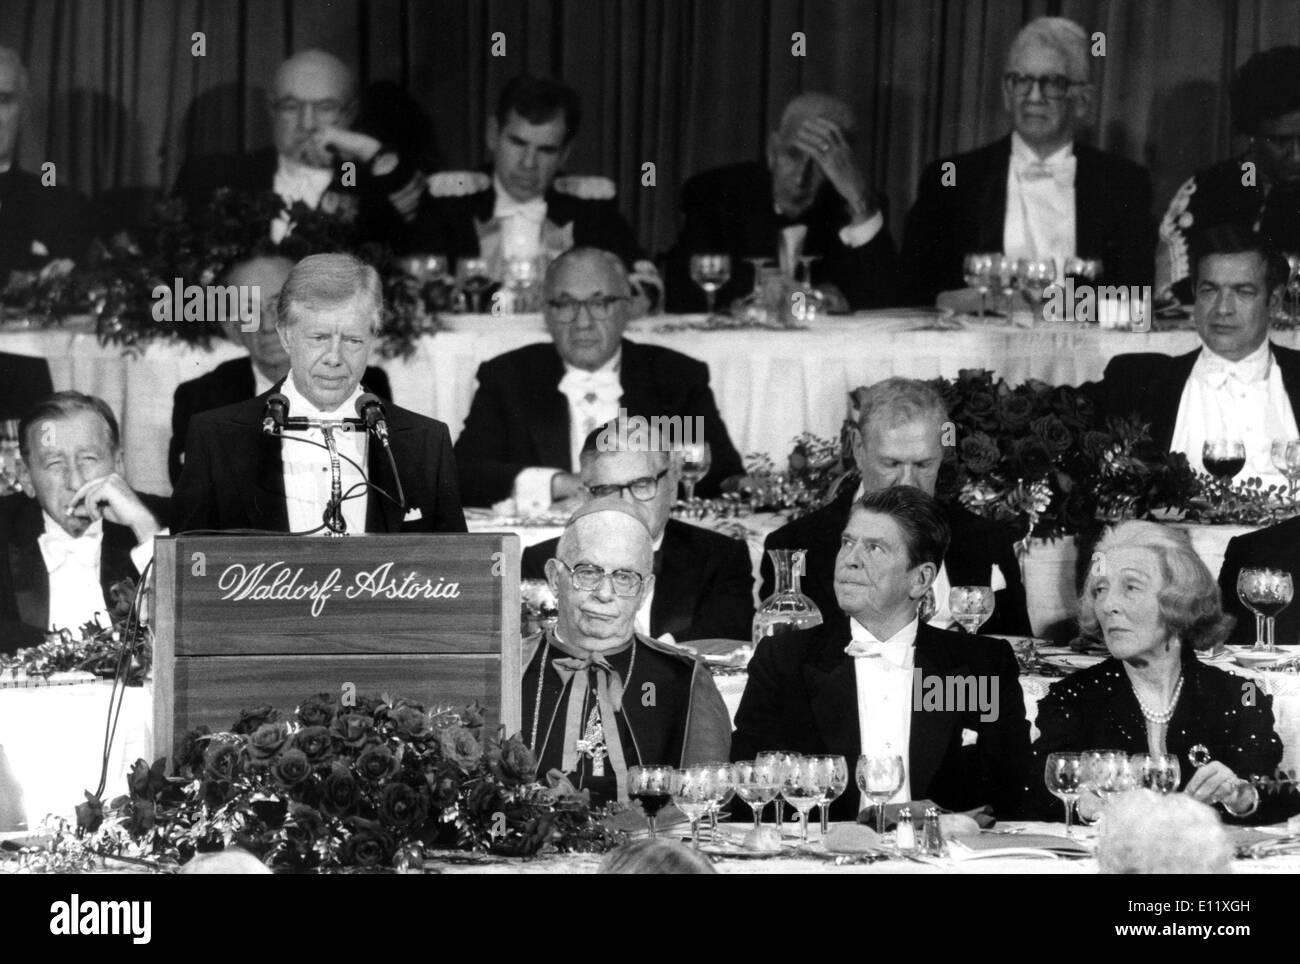 Oct 16, 1980; New York, NY, USA; REAGAN DIED JUNE 5, 2004. The 40th U.S. President (1981-89) RONALD WILSON REAGAN (Republican). - Stock Image